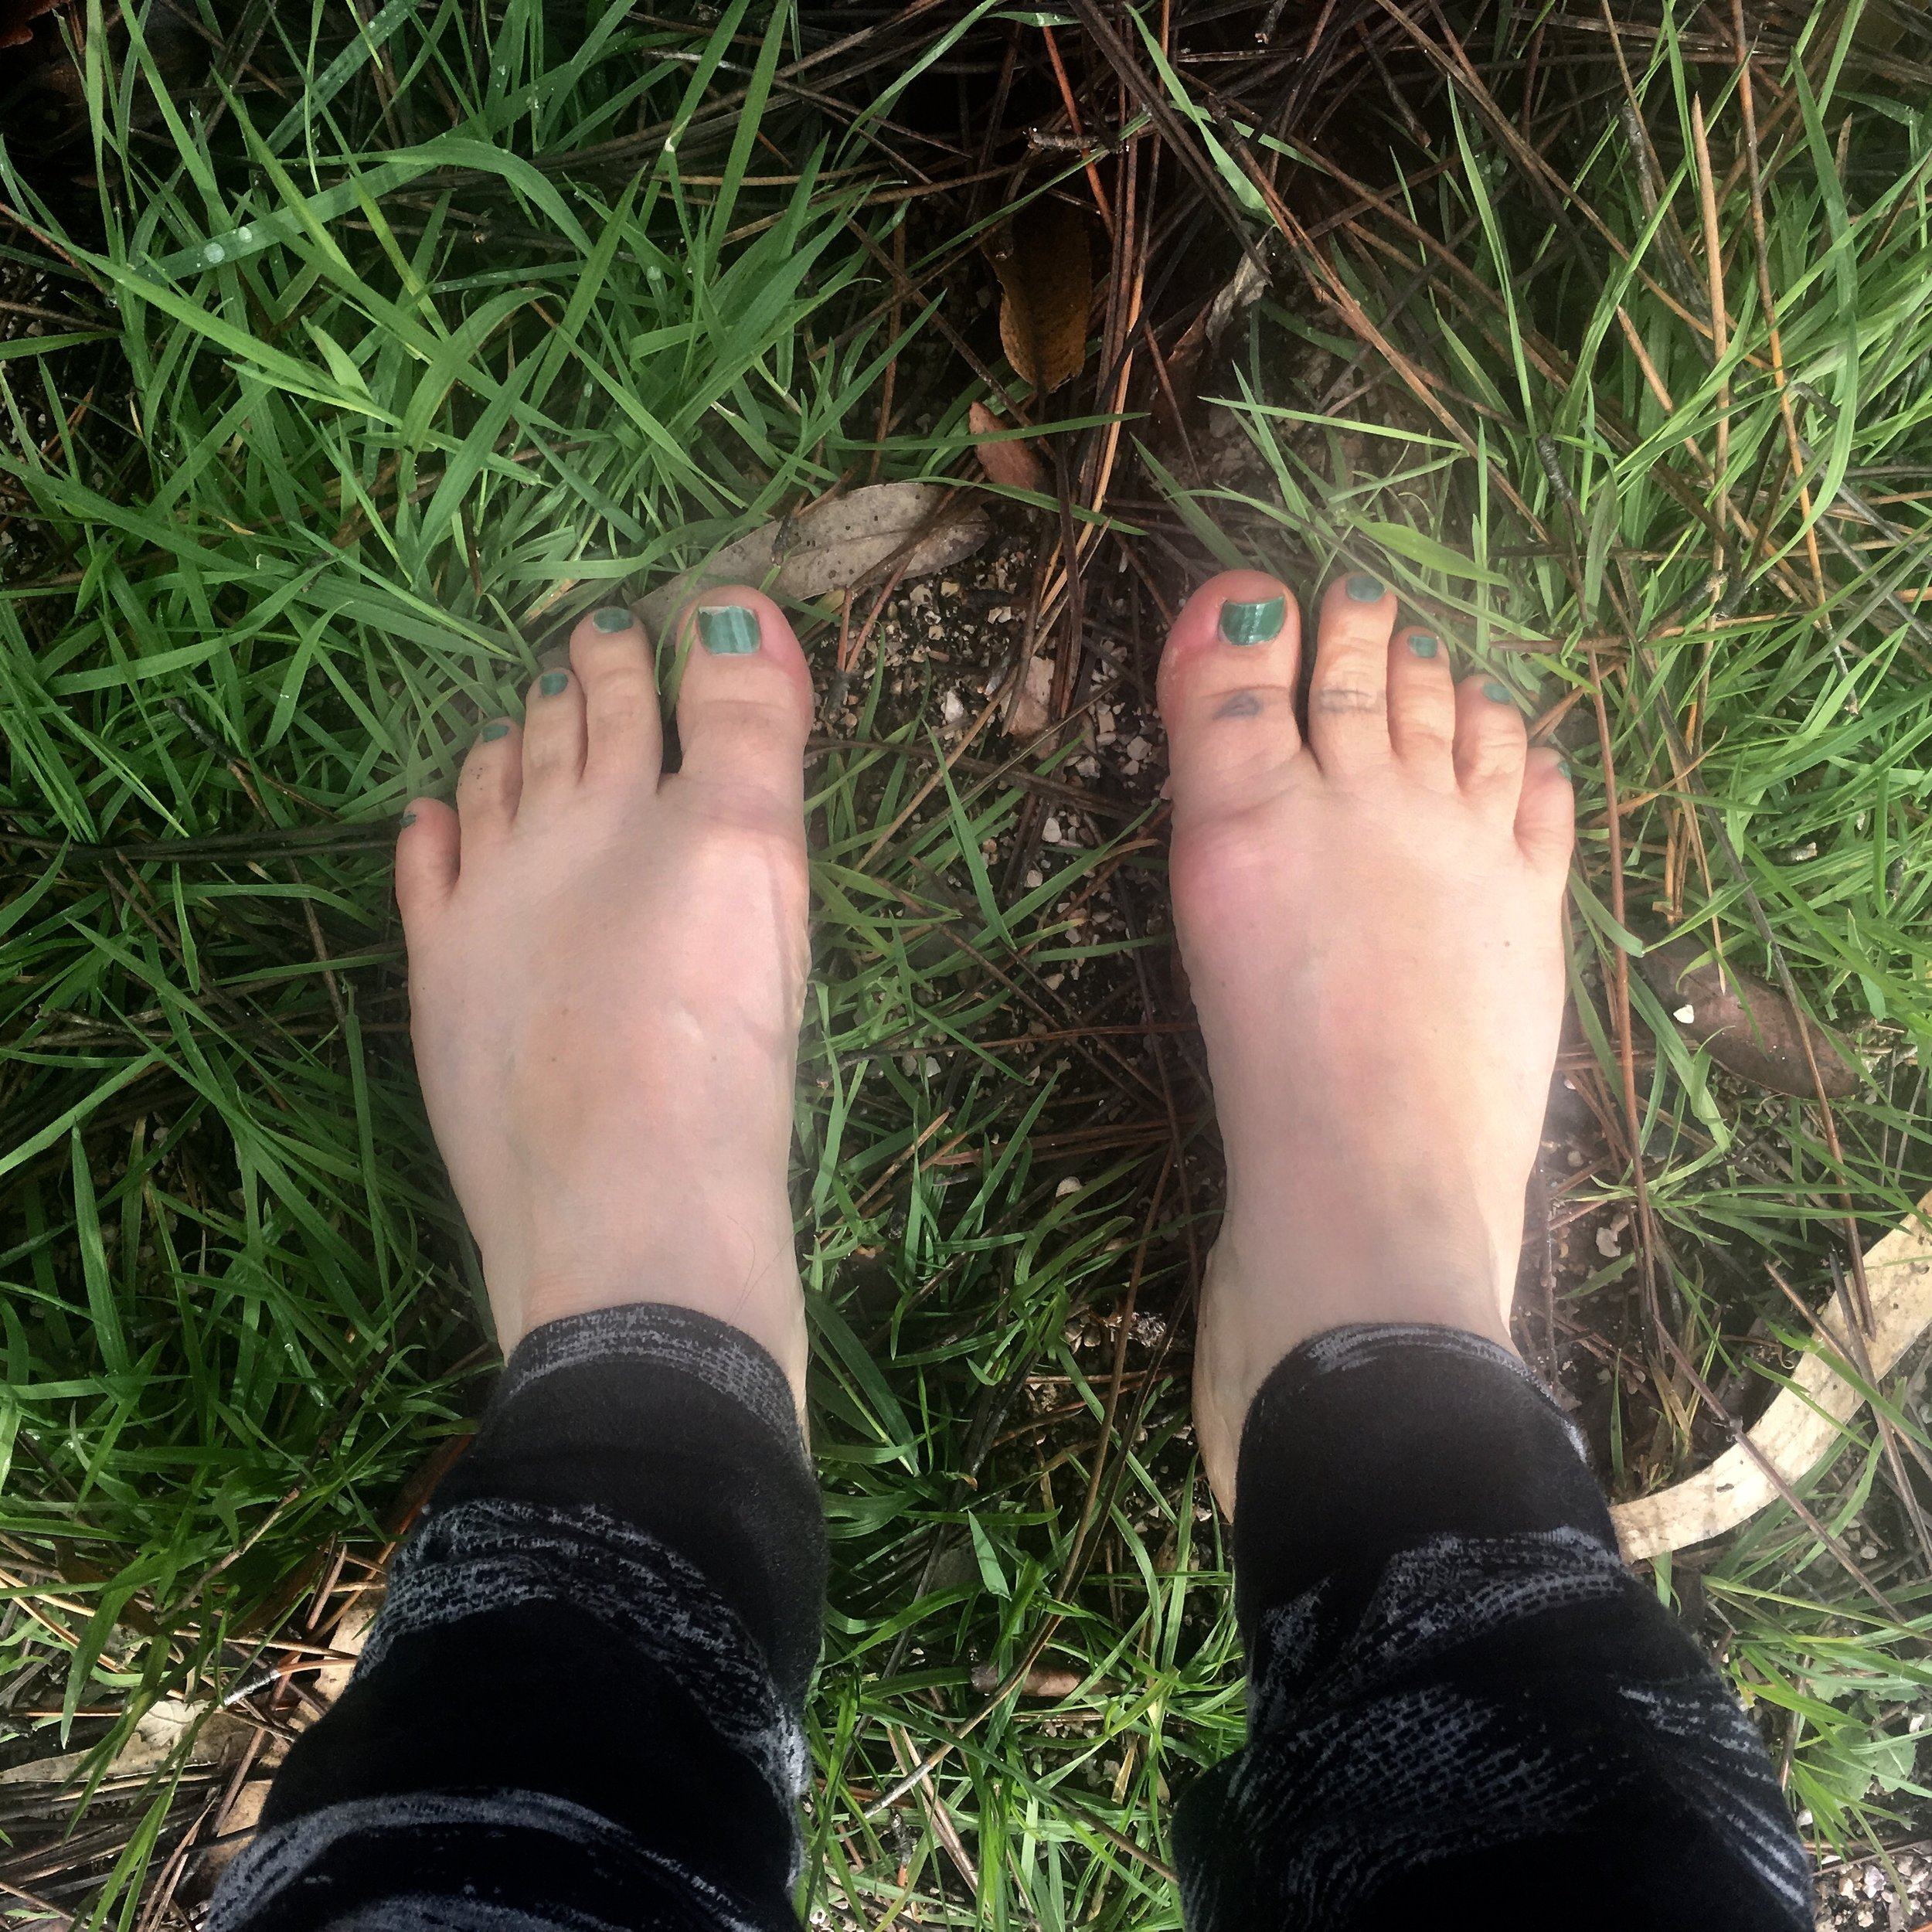 earth, yoga, yoga retreats, elements, prthivi, feet, padabandha, yoga yogasana, asana, retreats for women, nourish, nourish in nature, green toenails, hobbit feet